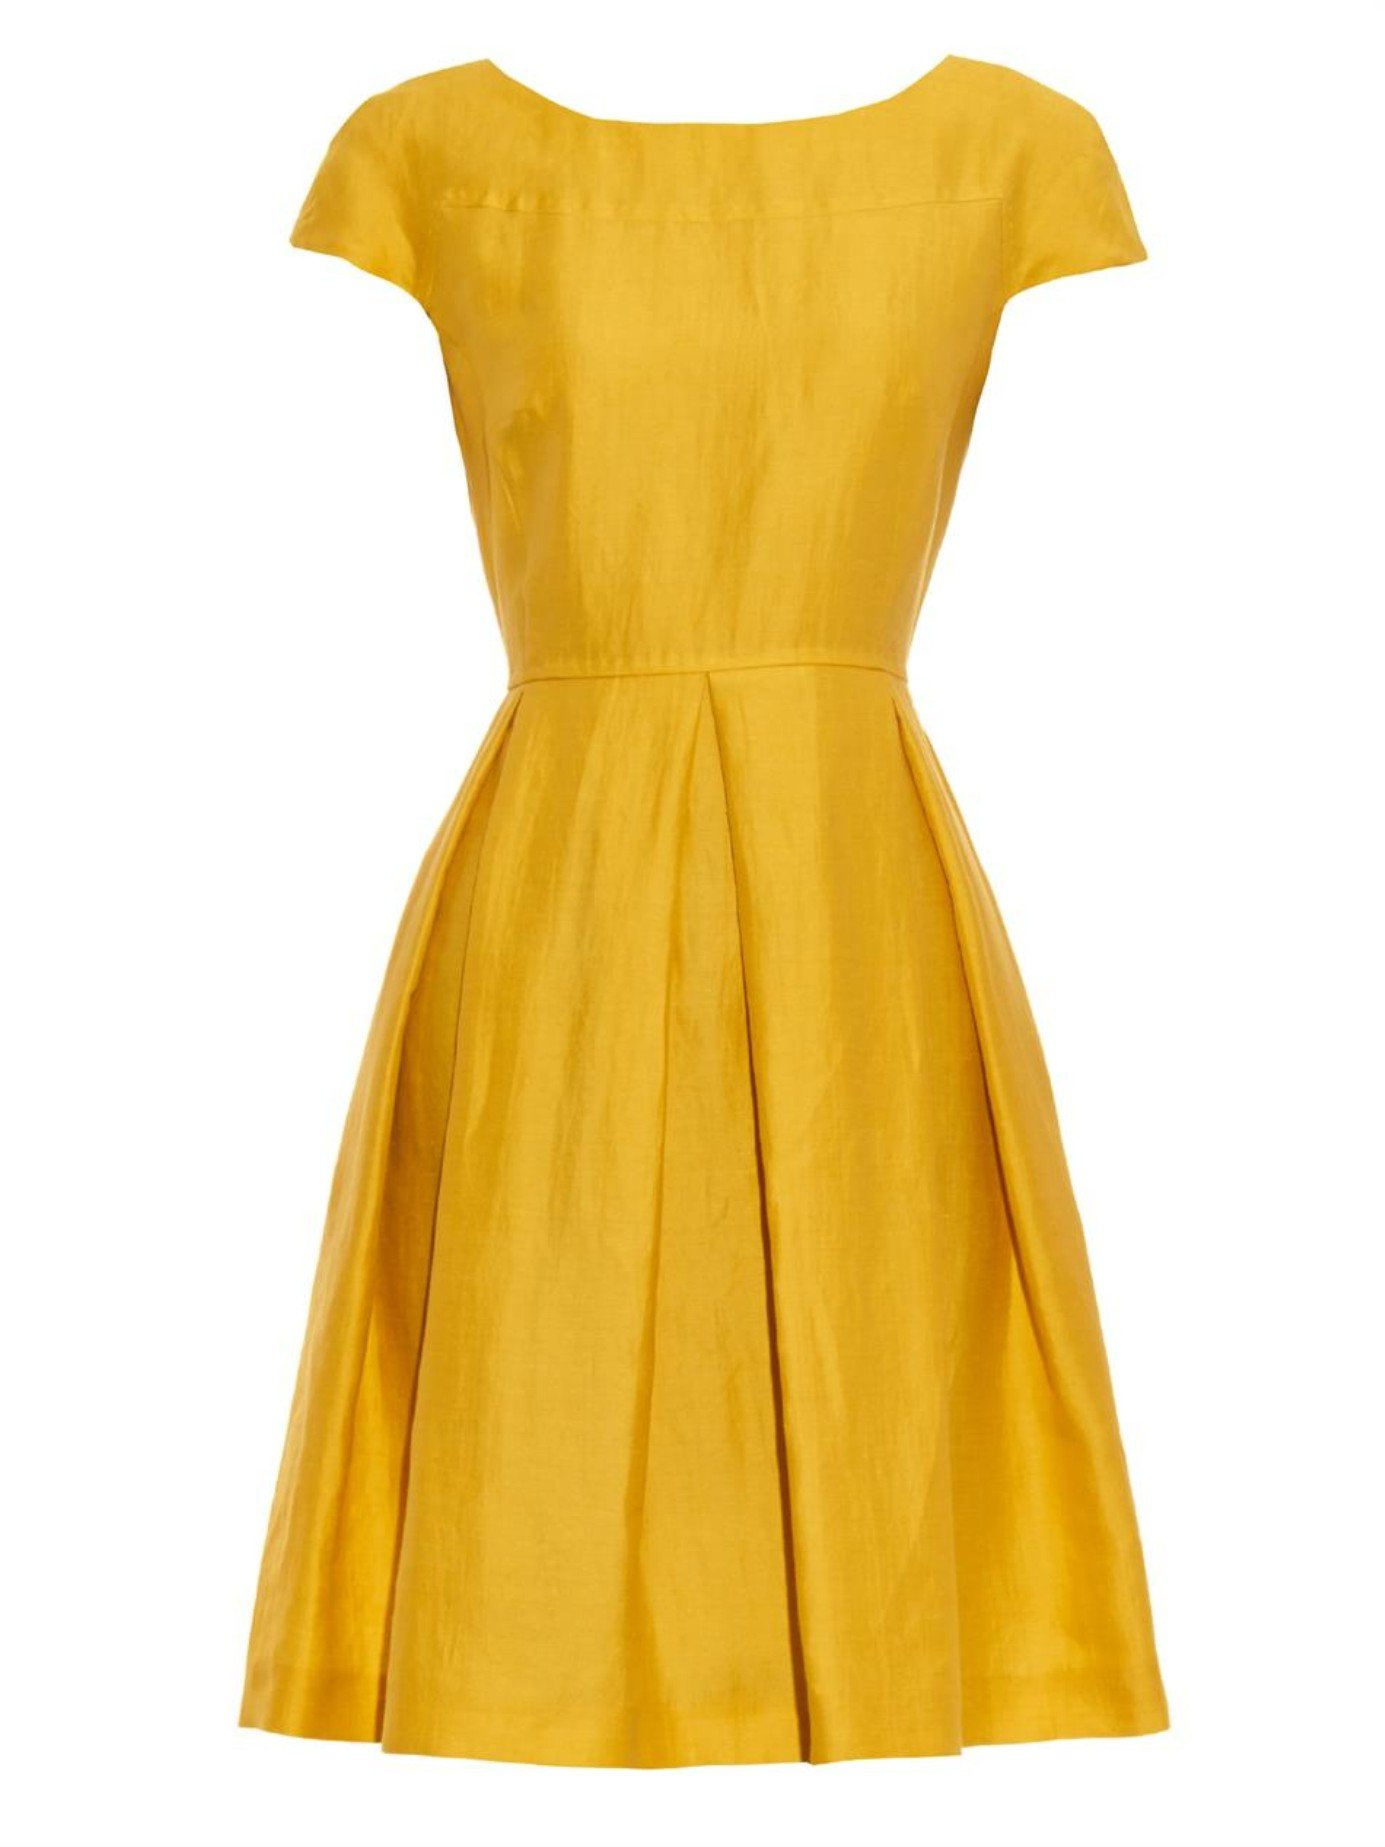 aa6dd9c369 Weekend by Maxmara Bray Dress in Yellow - Lyst